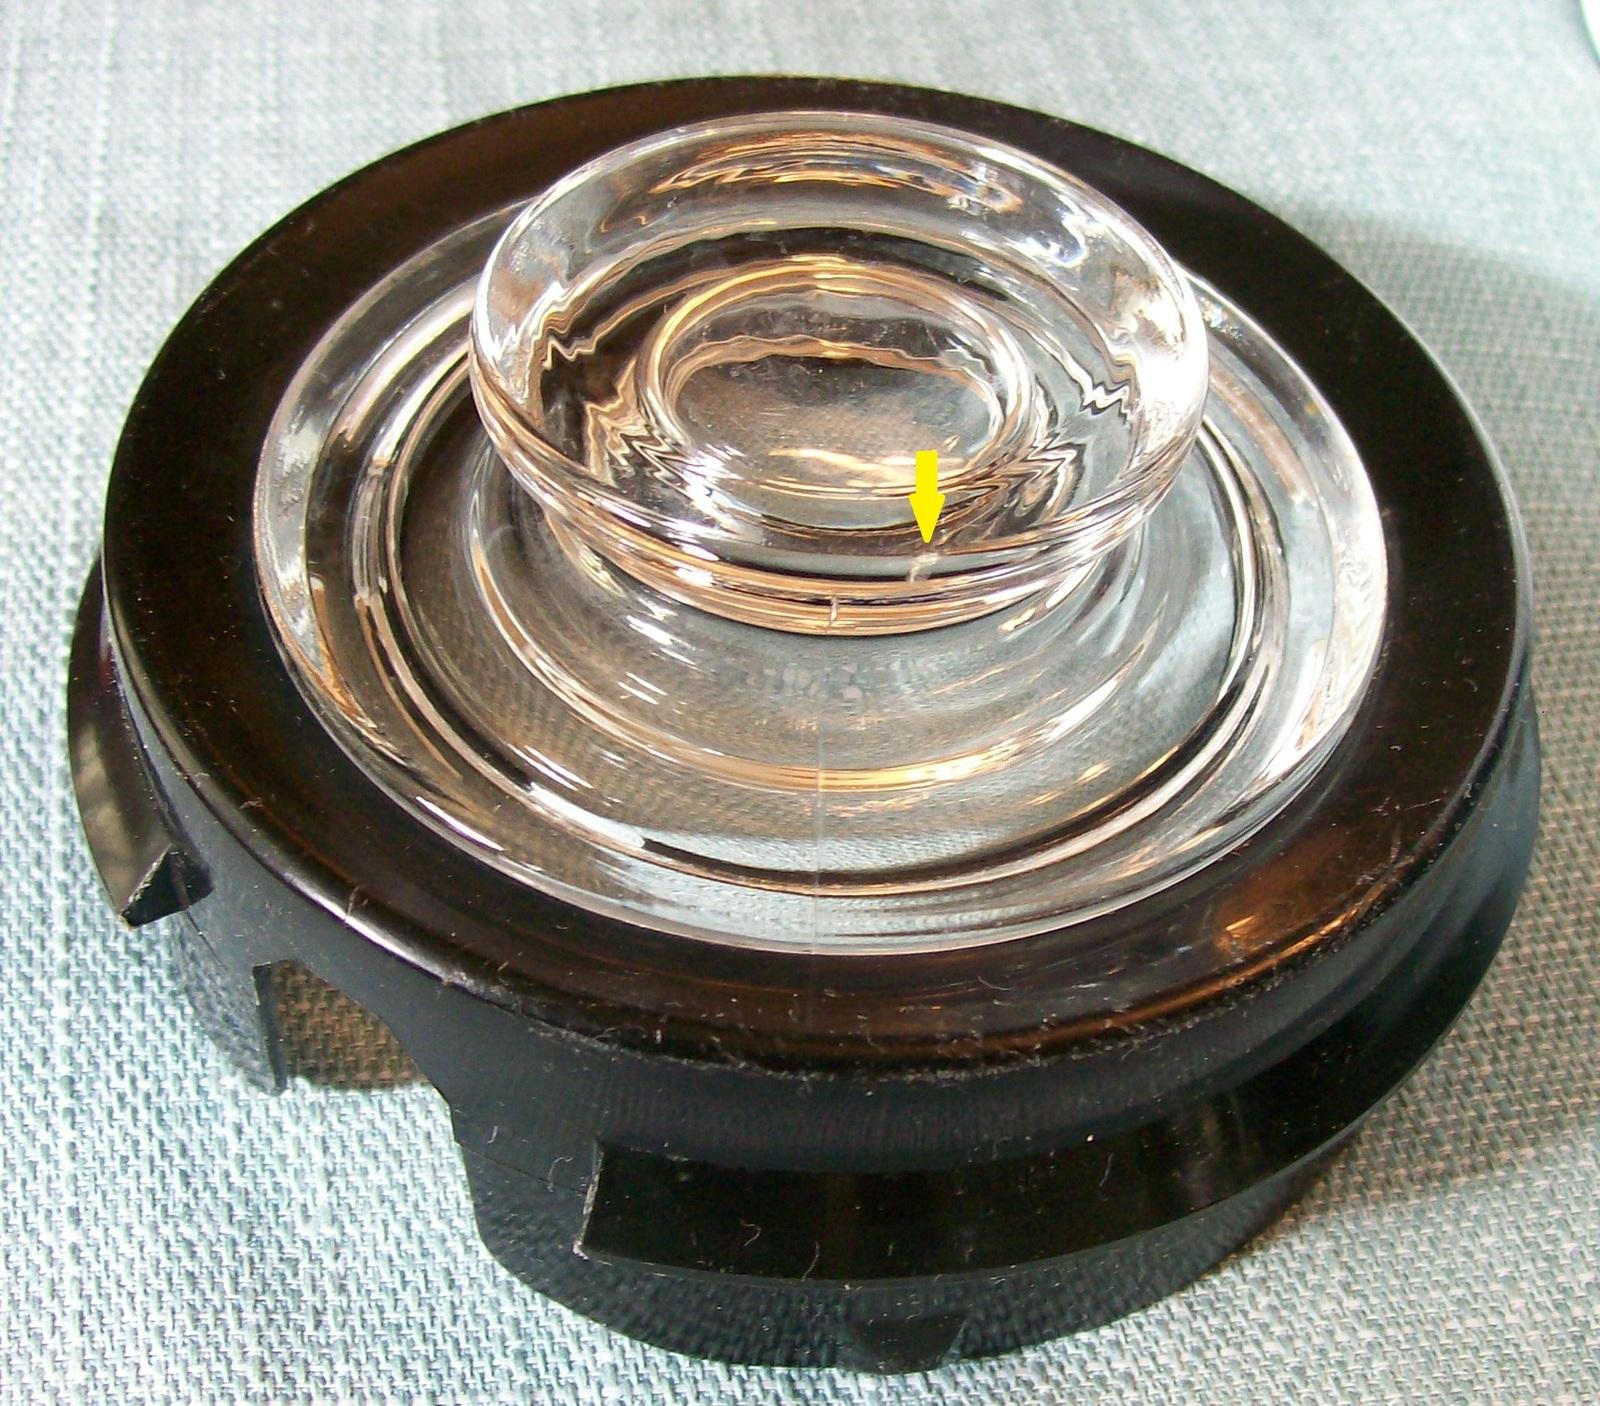 Corning Ware BLUE CORNFLOWER Electric Coffee Pot/Percolator 10 cup P-80-EP VGUVC